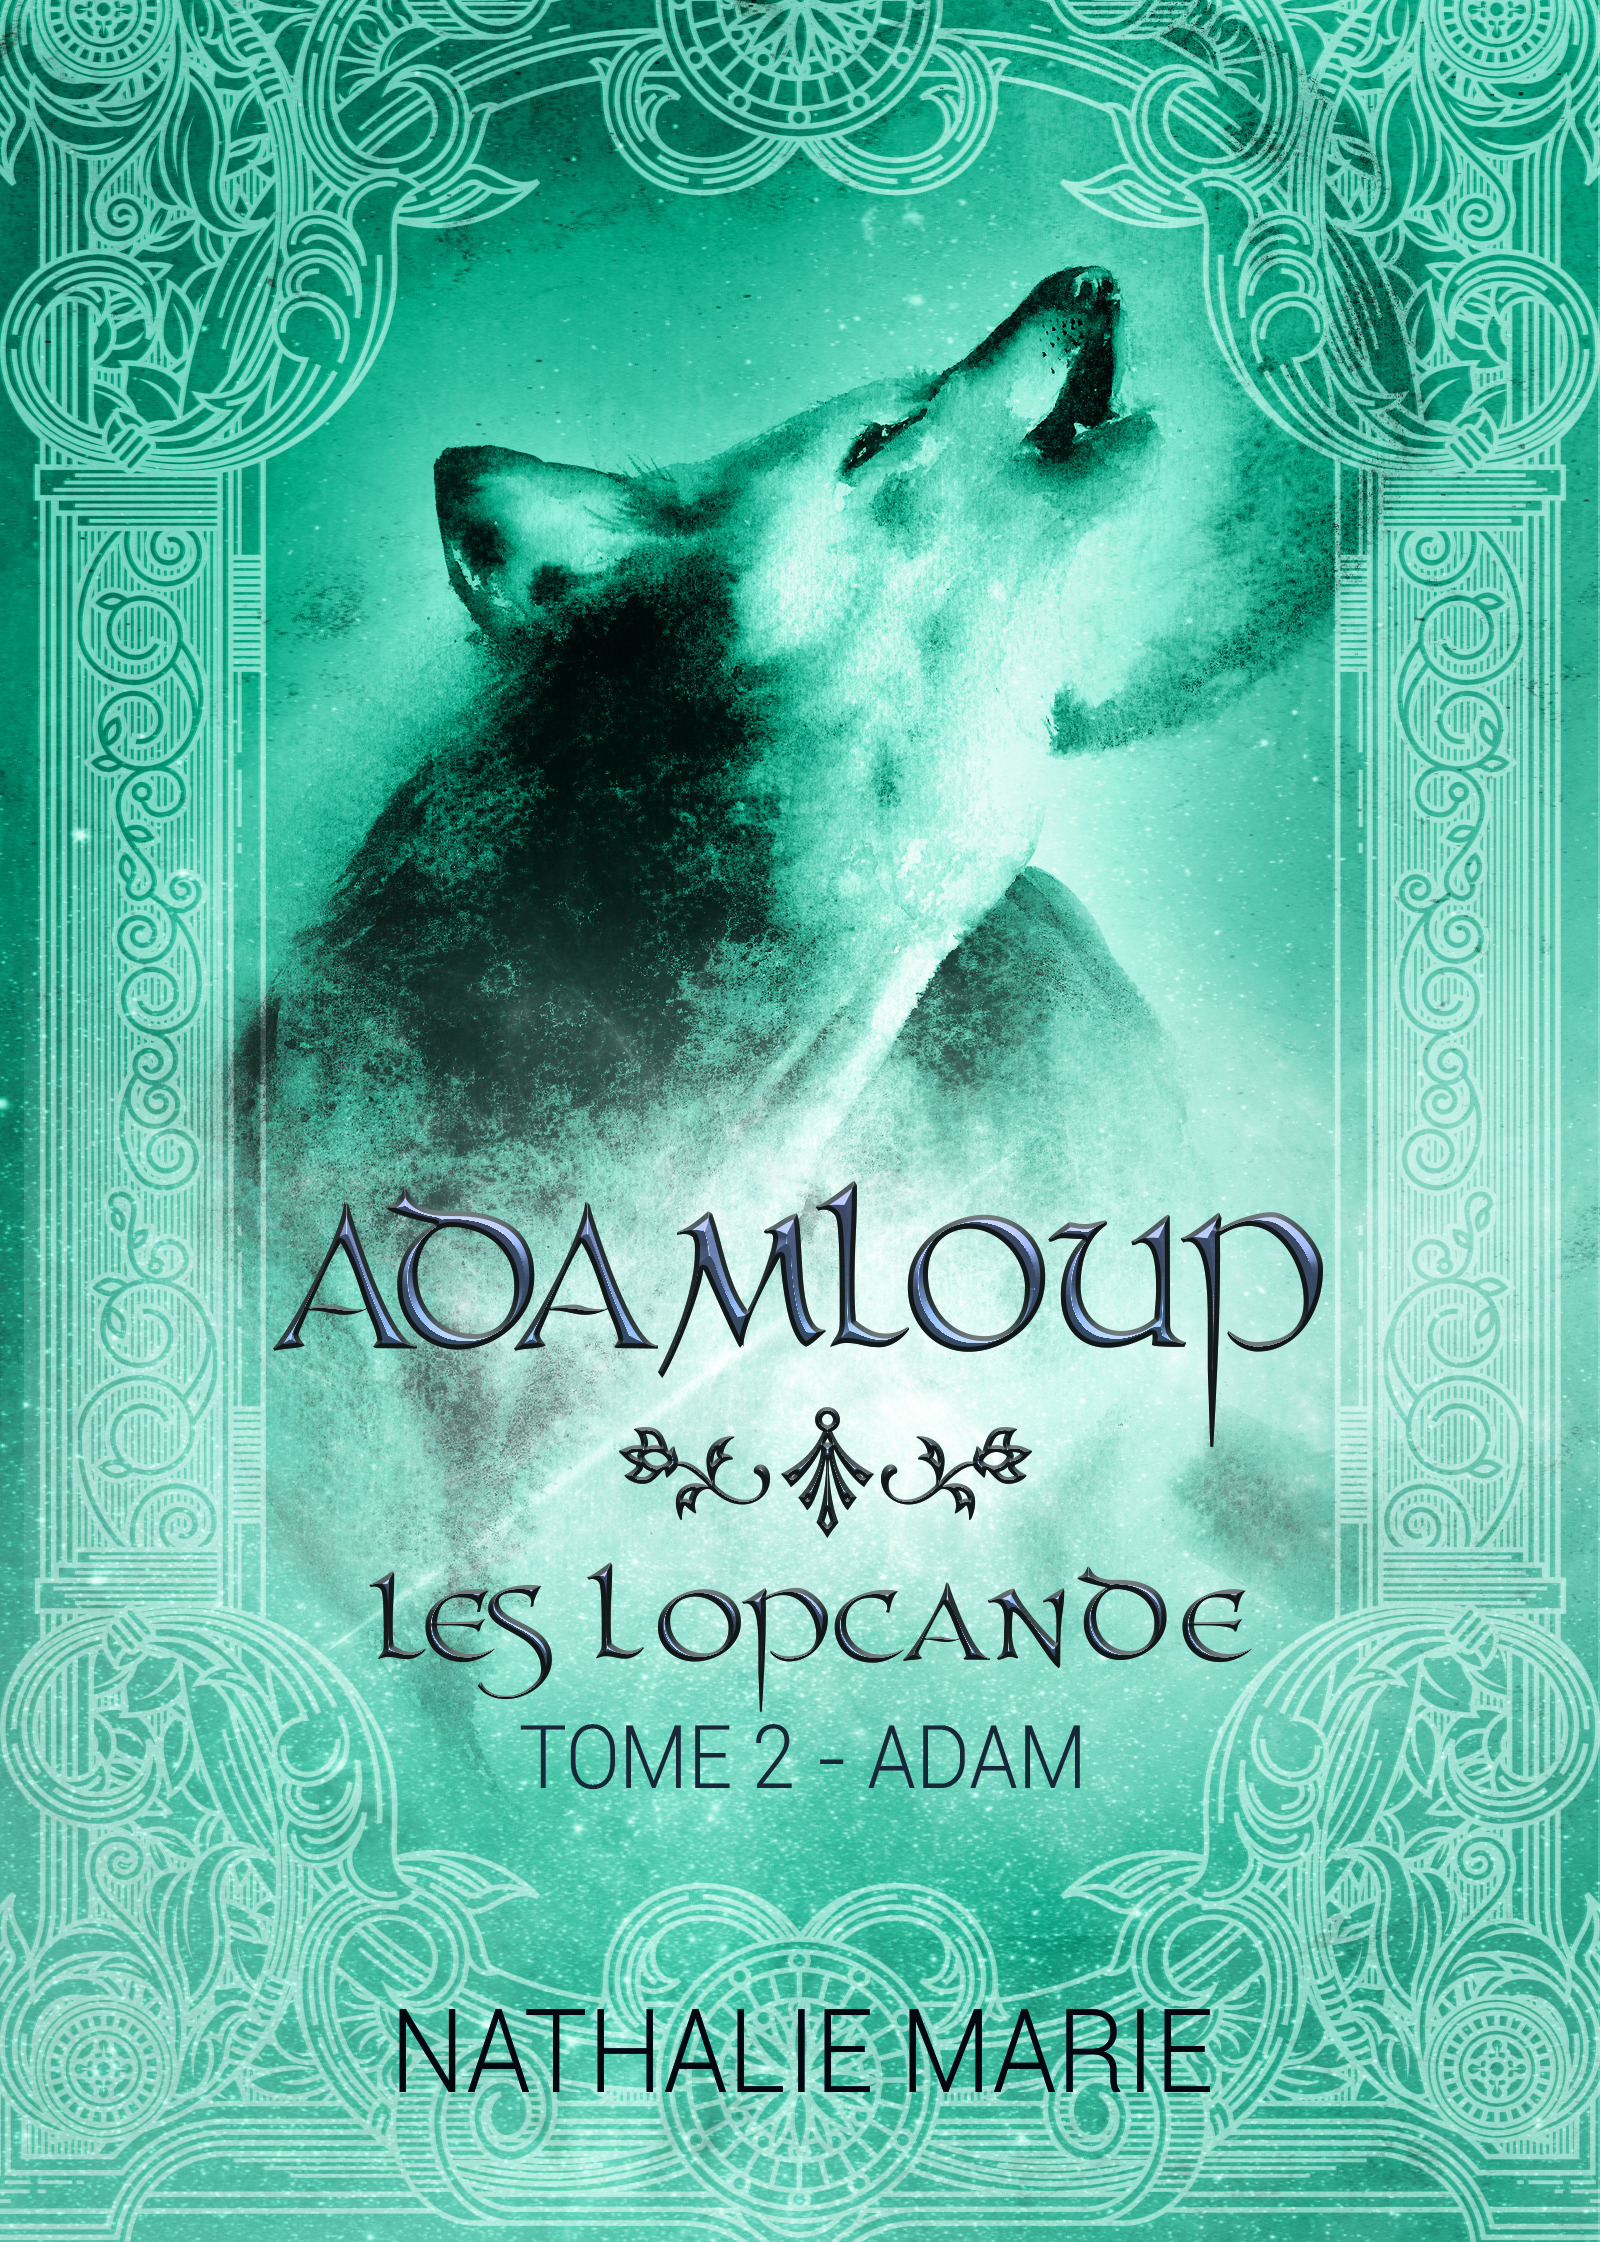 Les lopcande - t02 - adamloup - les lopcande : adam